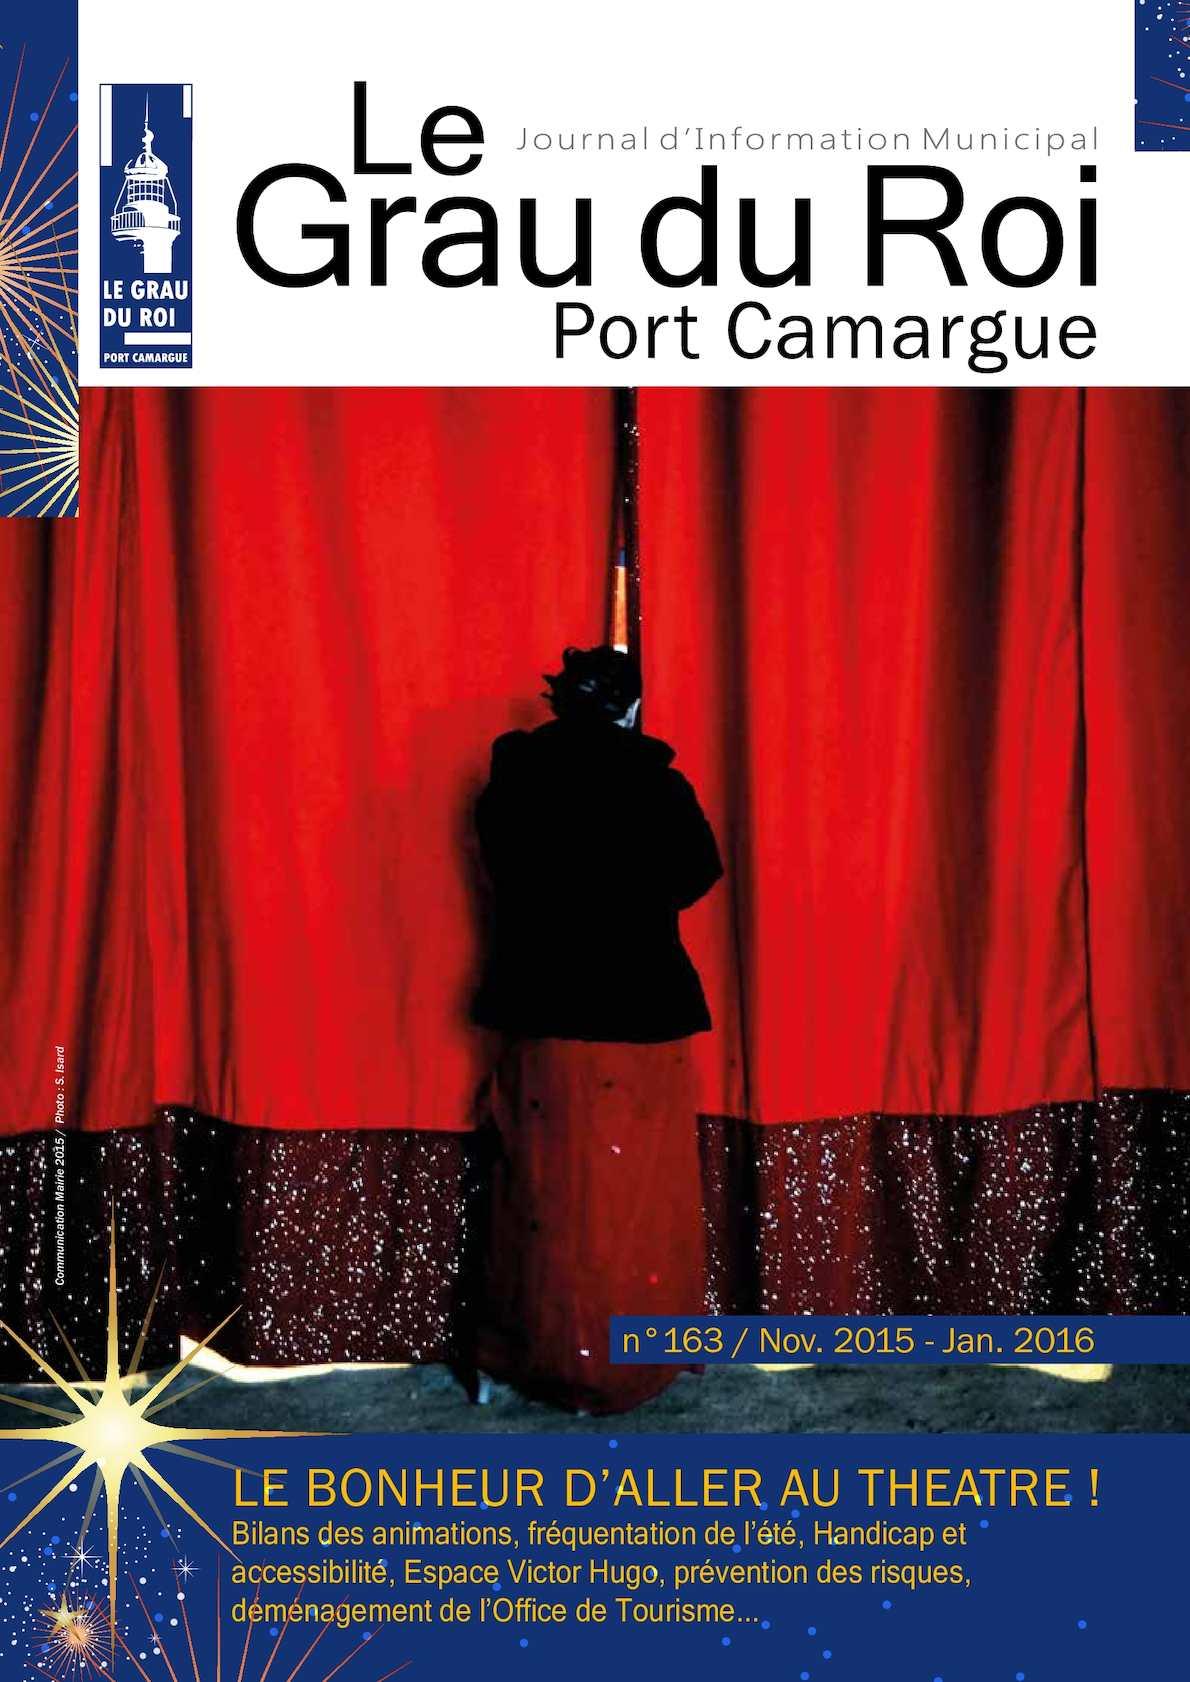 Calam o le grau du roi port camargue journal d information municipal n 163 nov 2015 - Office du tourisme grau du roi ...